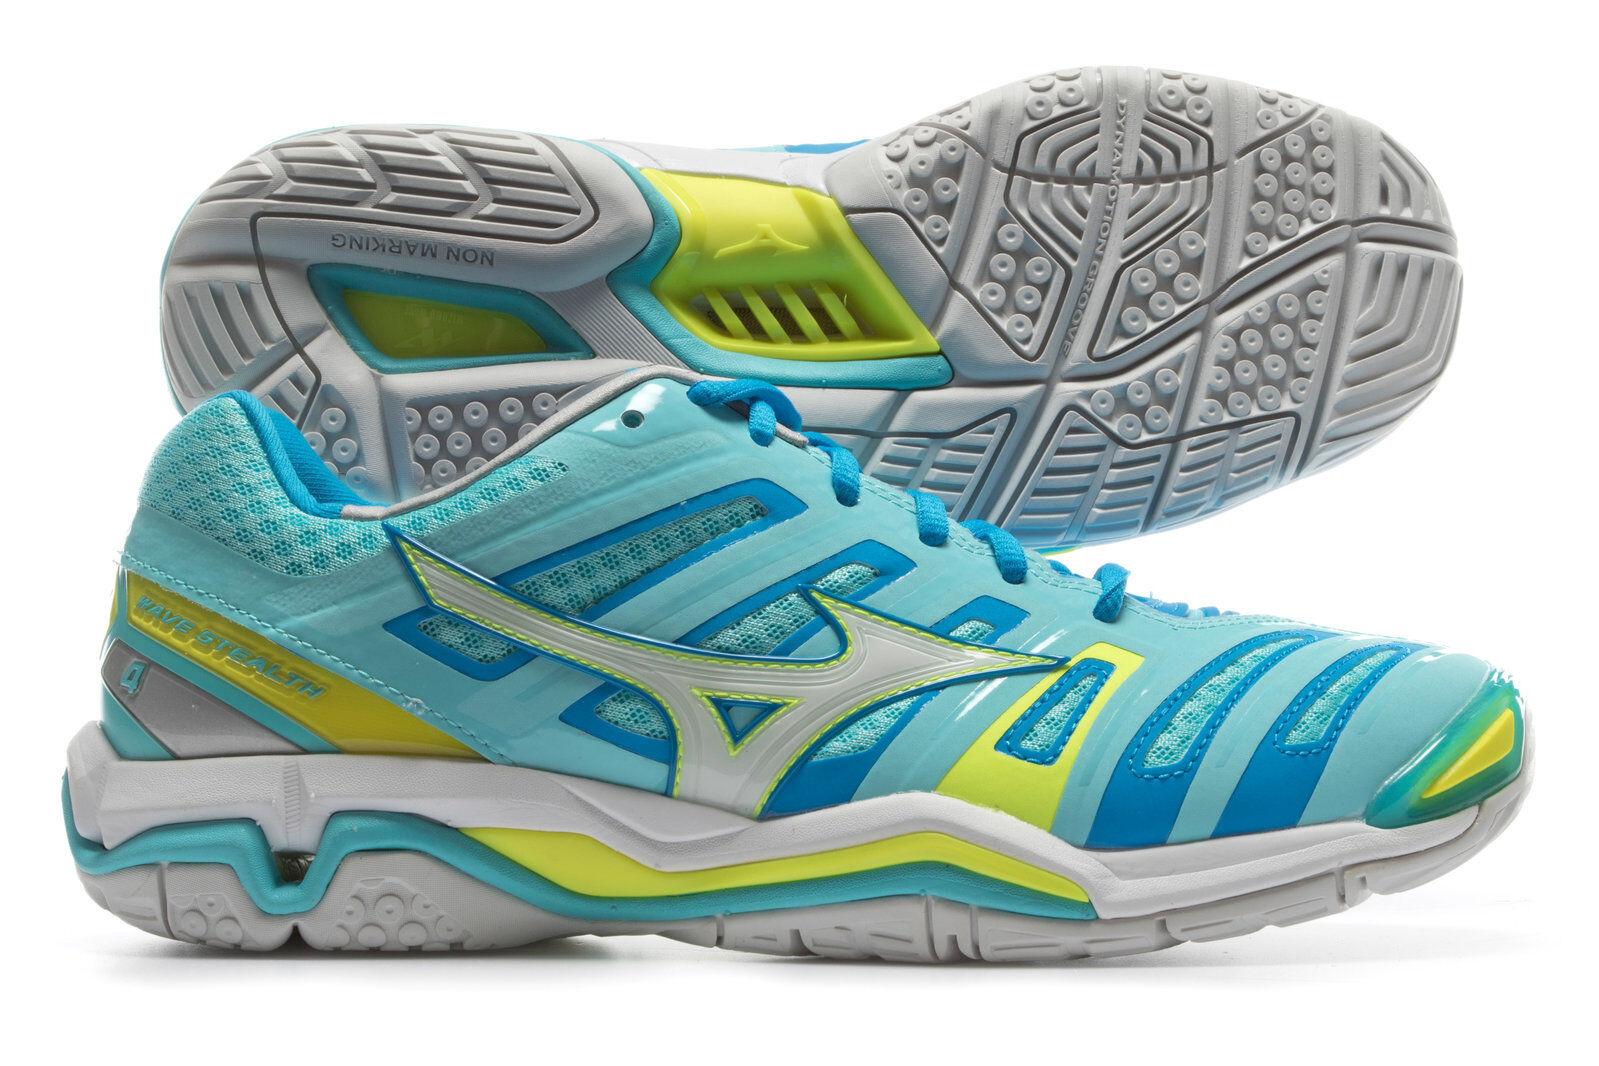 Mizuno Damenschuhe 4 Wave Stealth 4 Damenschuhe Netball Trainers Schuhes Sneakers Sports f36322